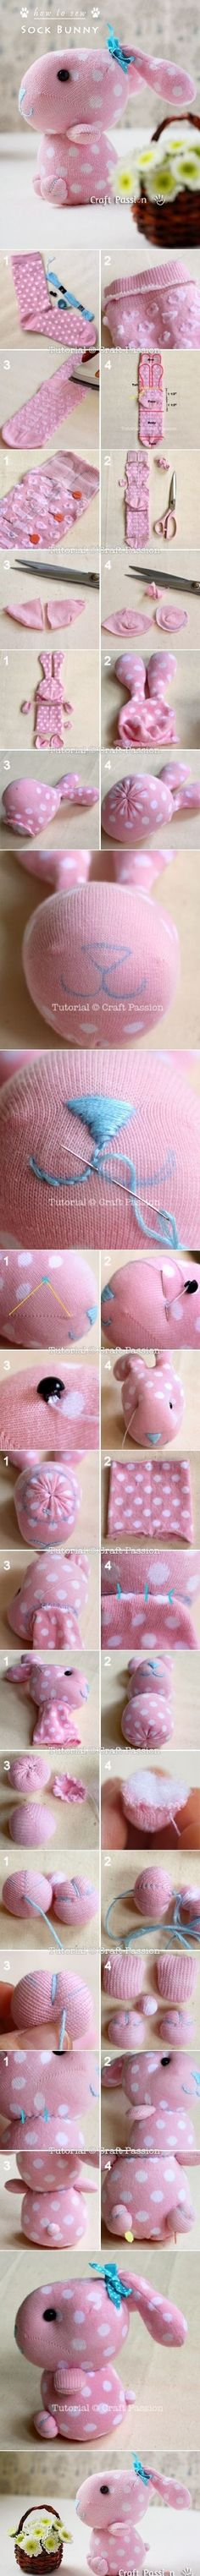 DIY Sock Bunny Sewing Tutorial